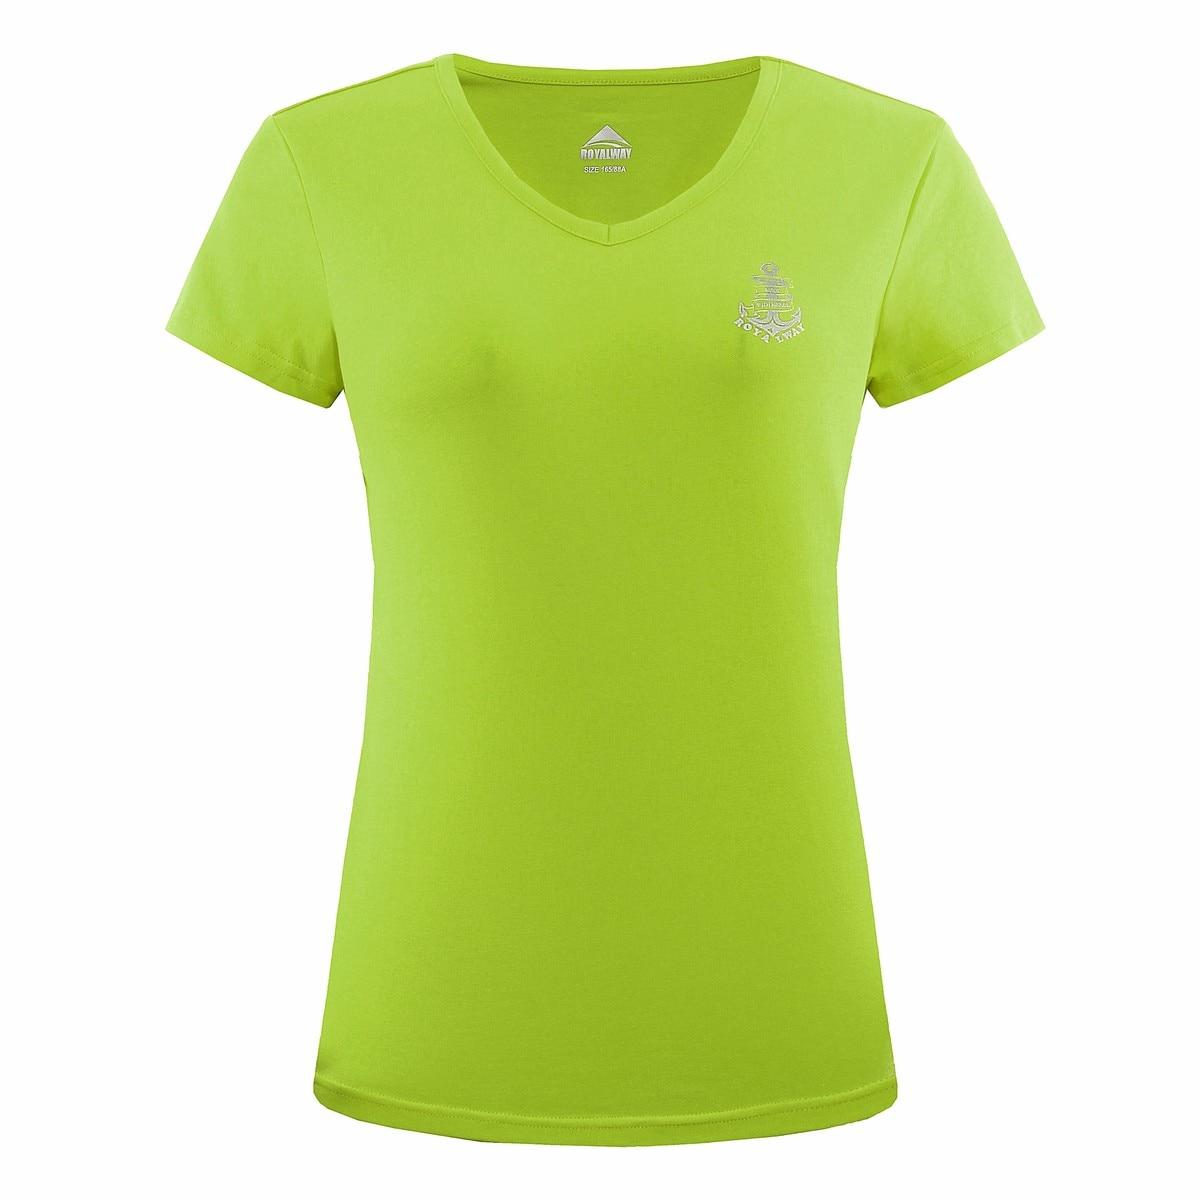 Shirt#RFTL2022Glianmeng T-shirts discount Hunting